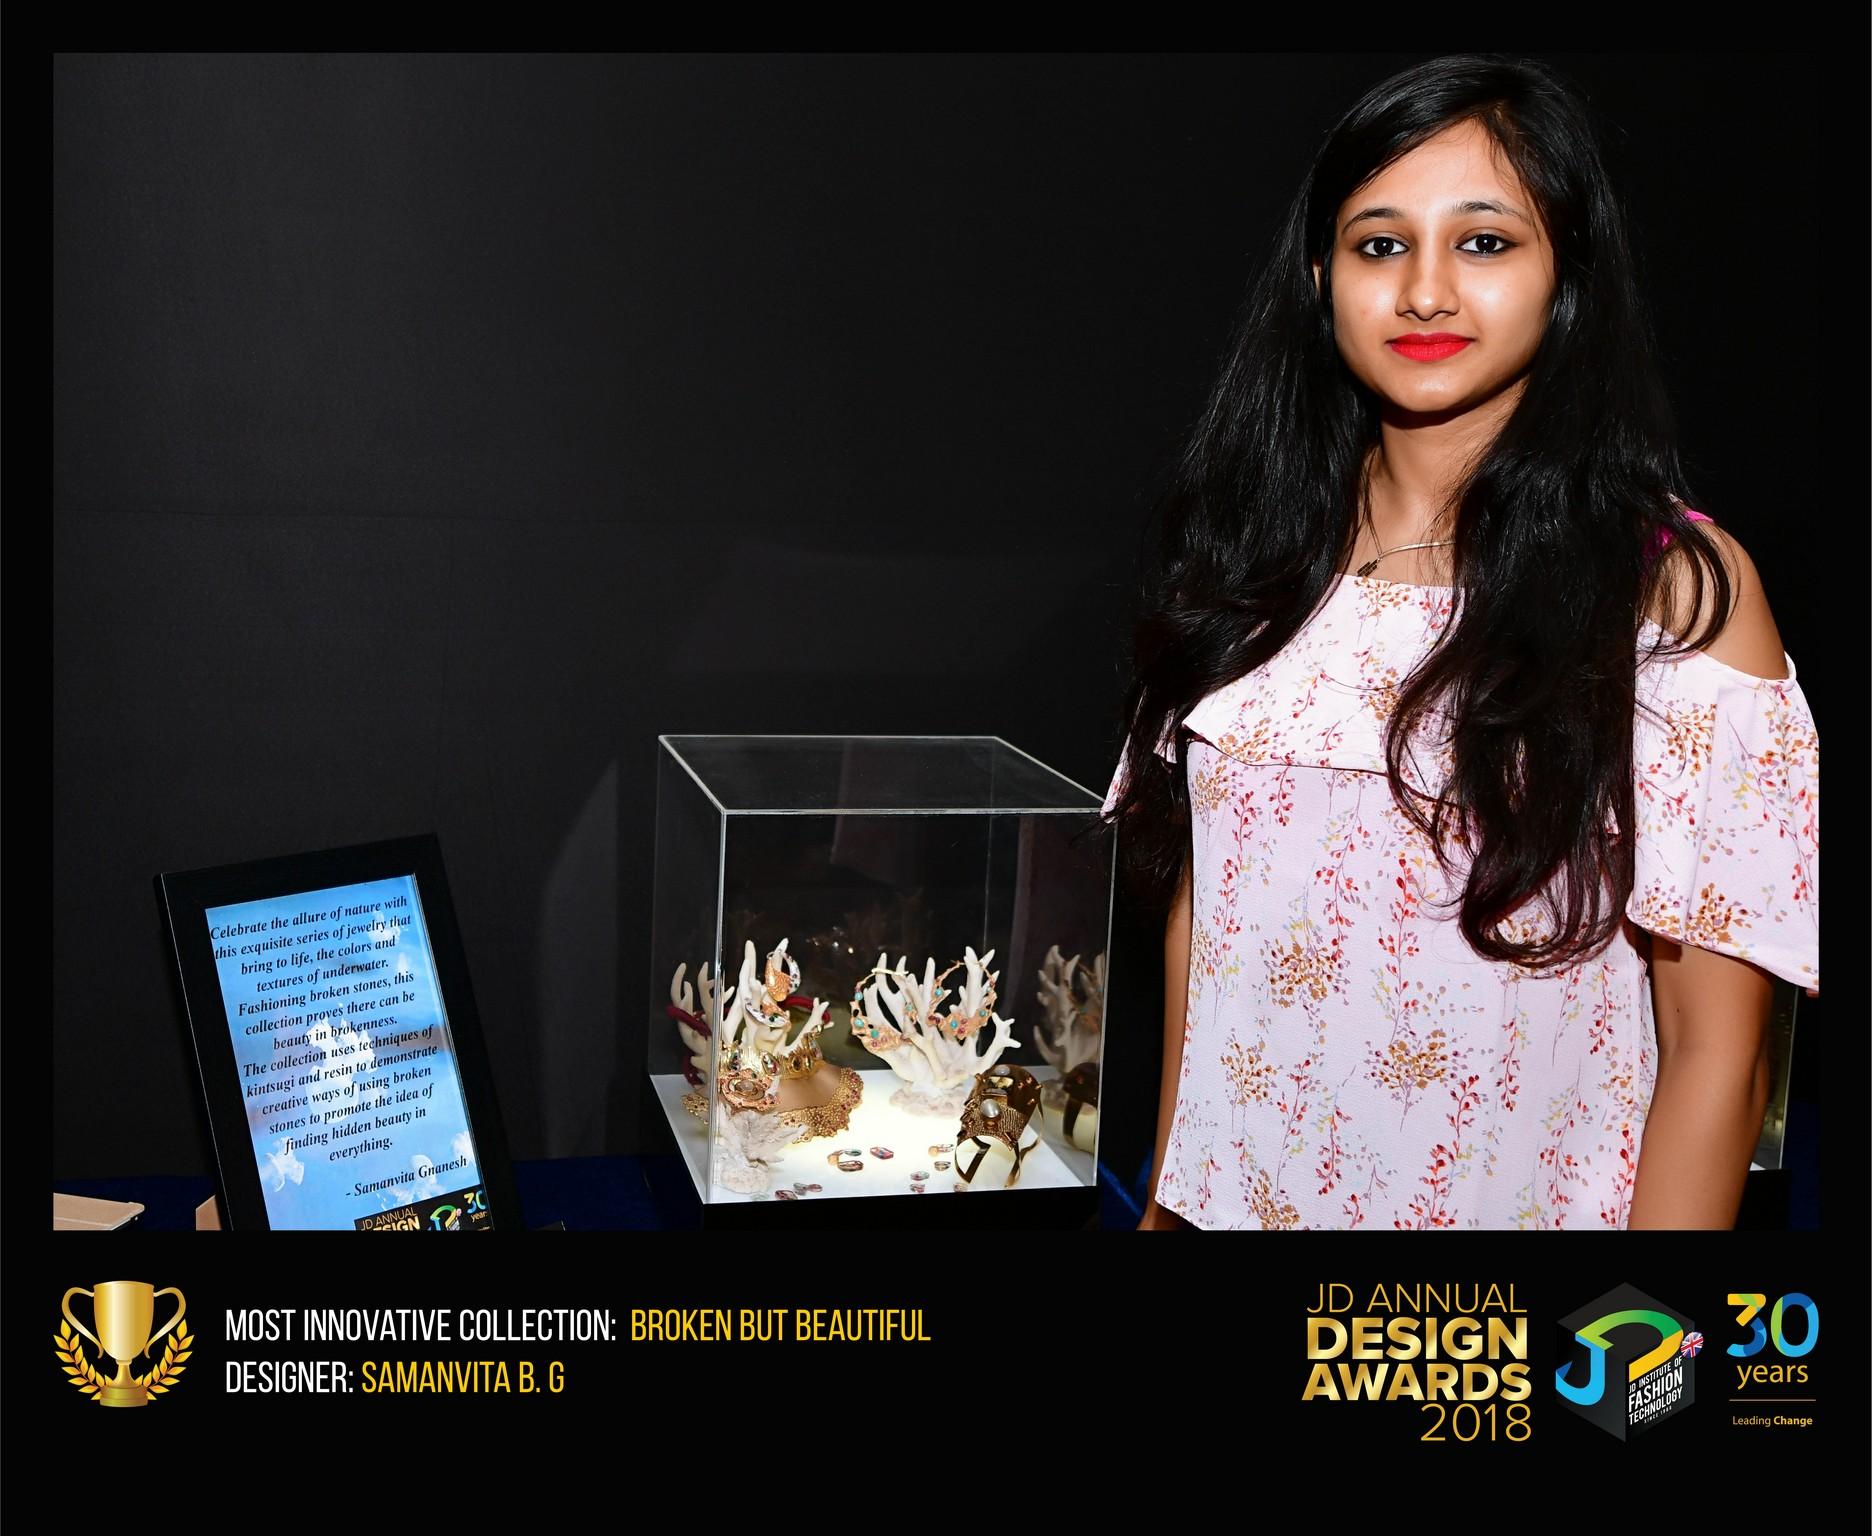 broken but beautiful Broken but Beautiful – Change – JD Annual Design Awards 2018 Samanvita2